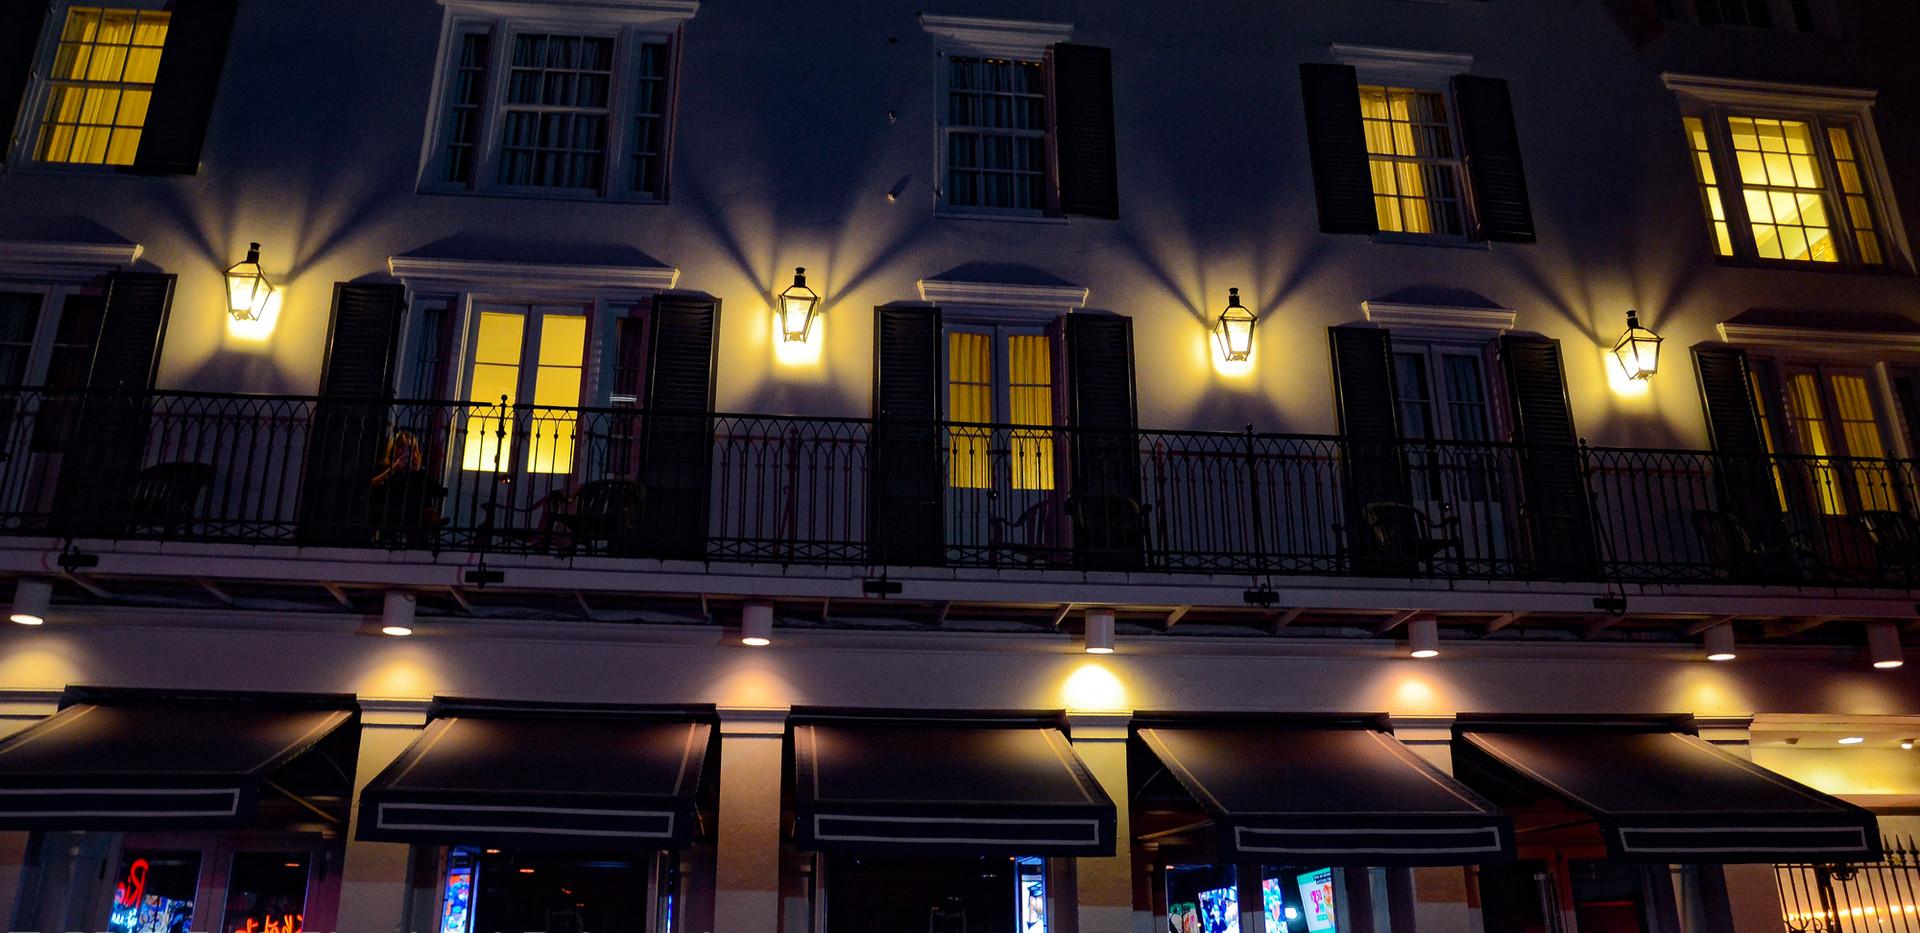 French Quarter Scenes